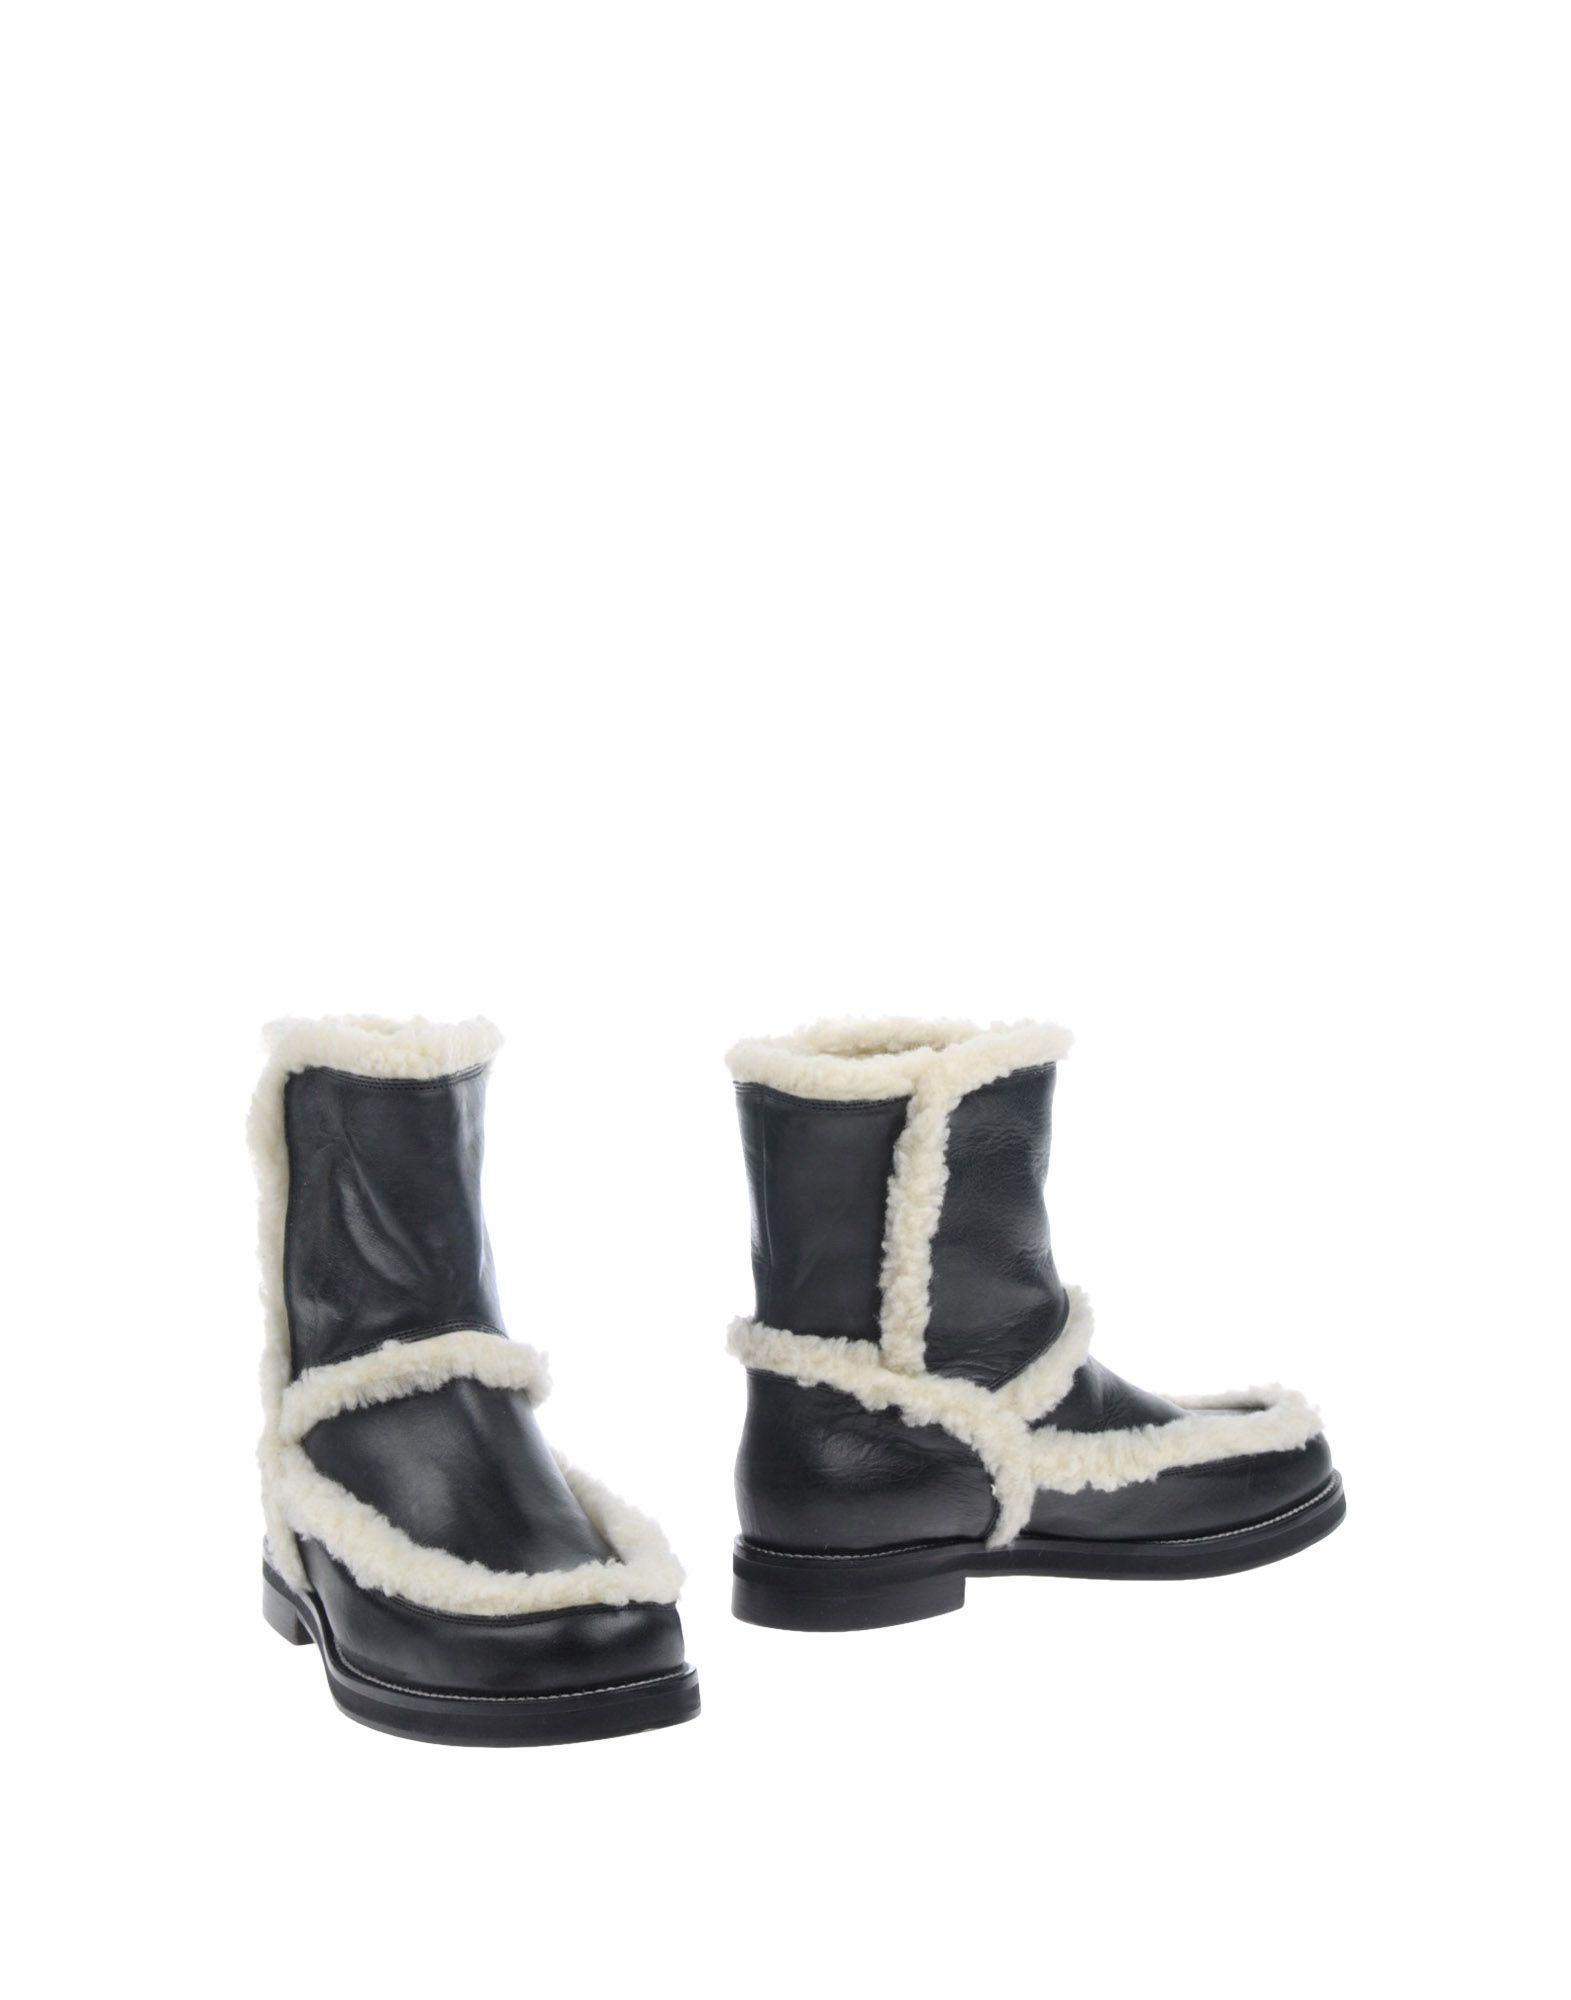 Stilvolle billige Schuhe Mm6 Maison 11290103HL Margiela Stiefelette Damen  11290103HL Maison 084404